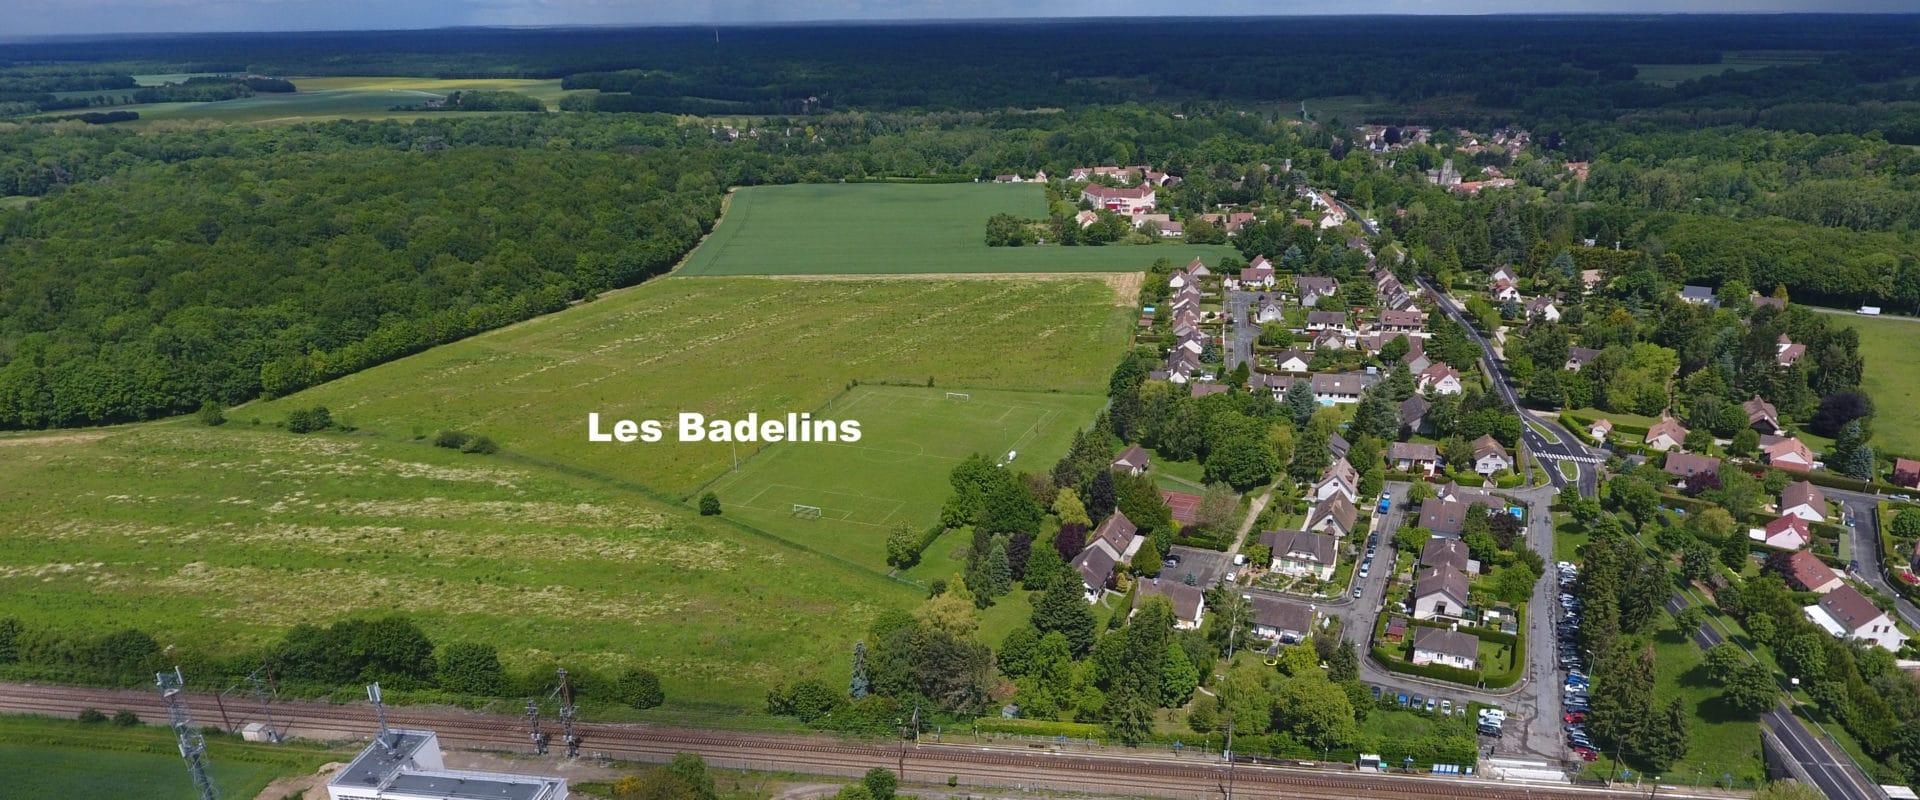 Gazeran – Les Badelins (78)